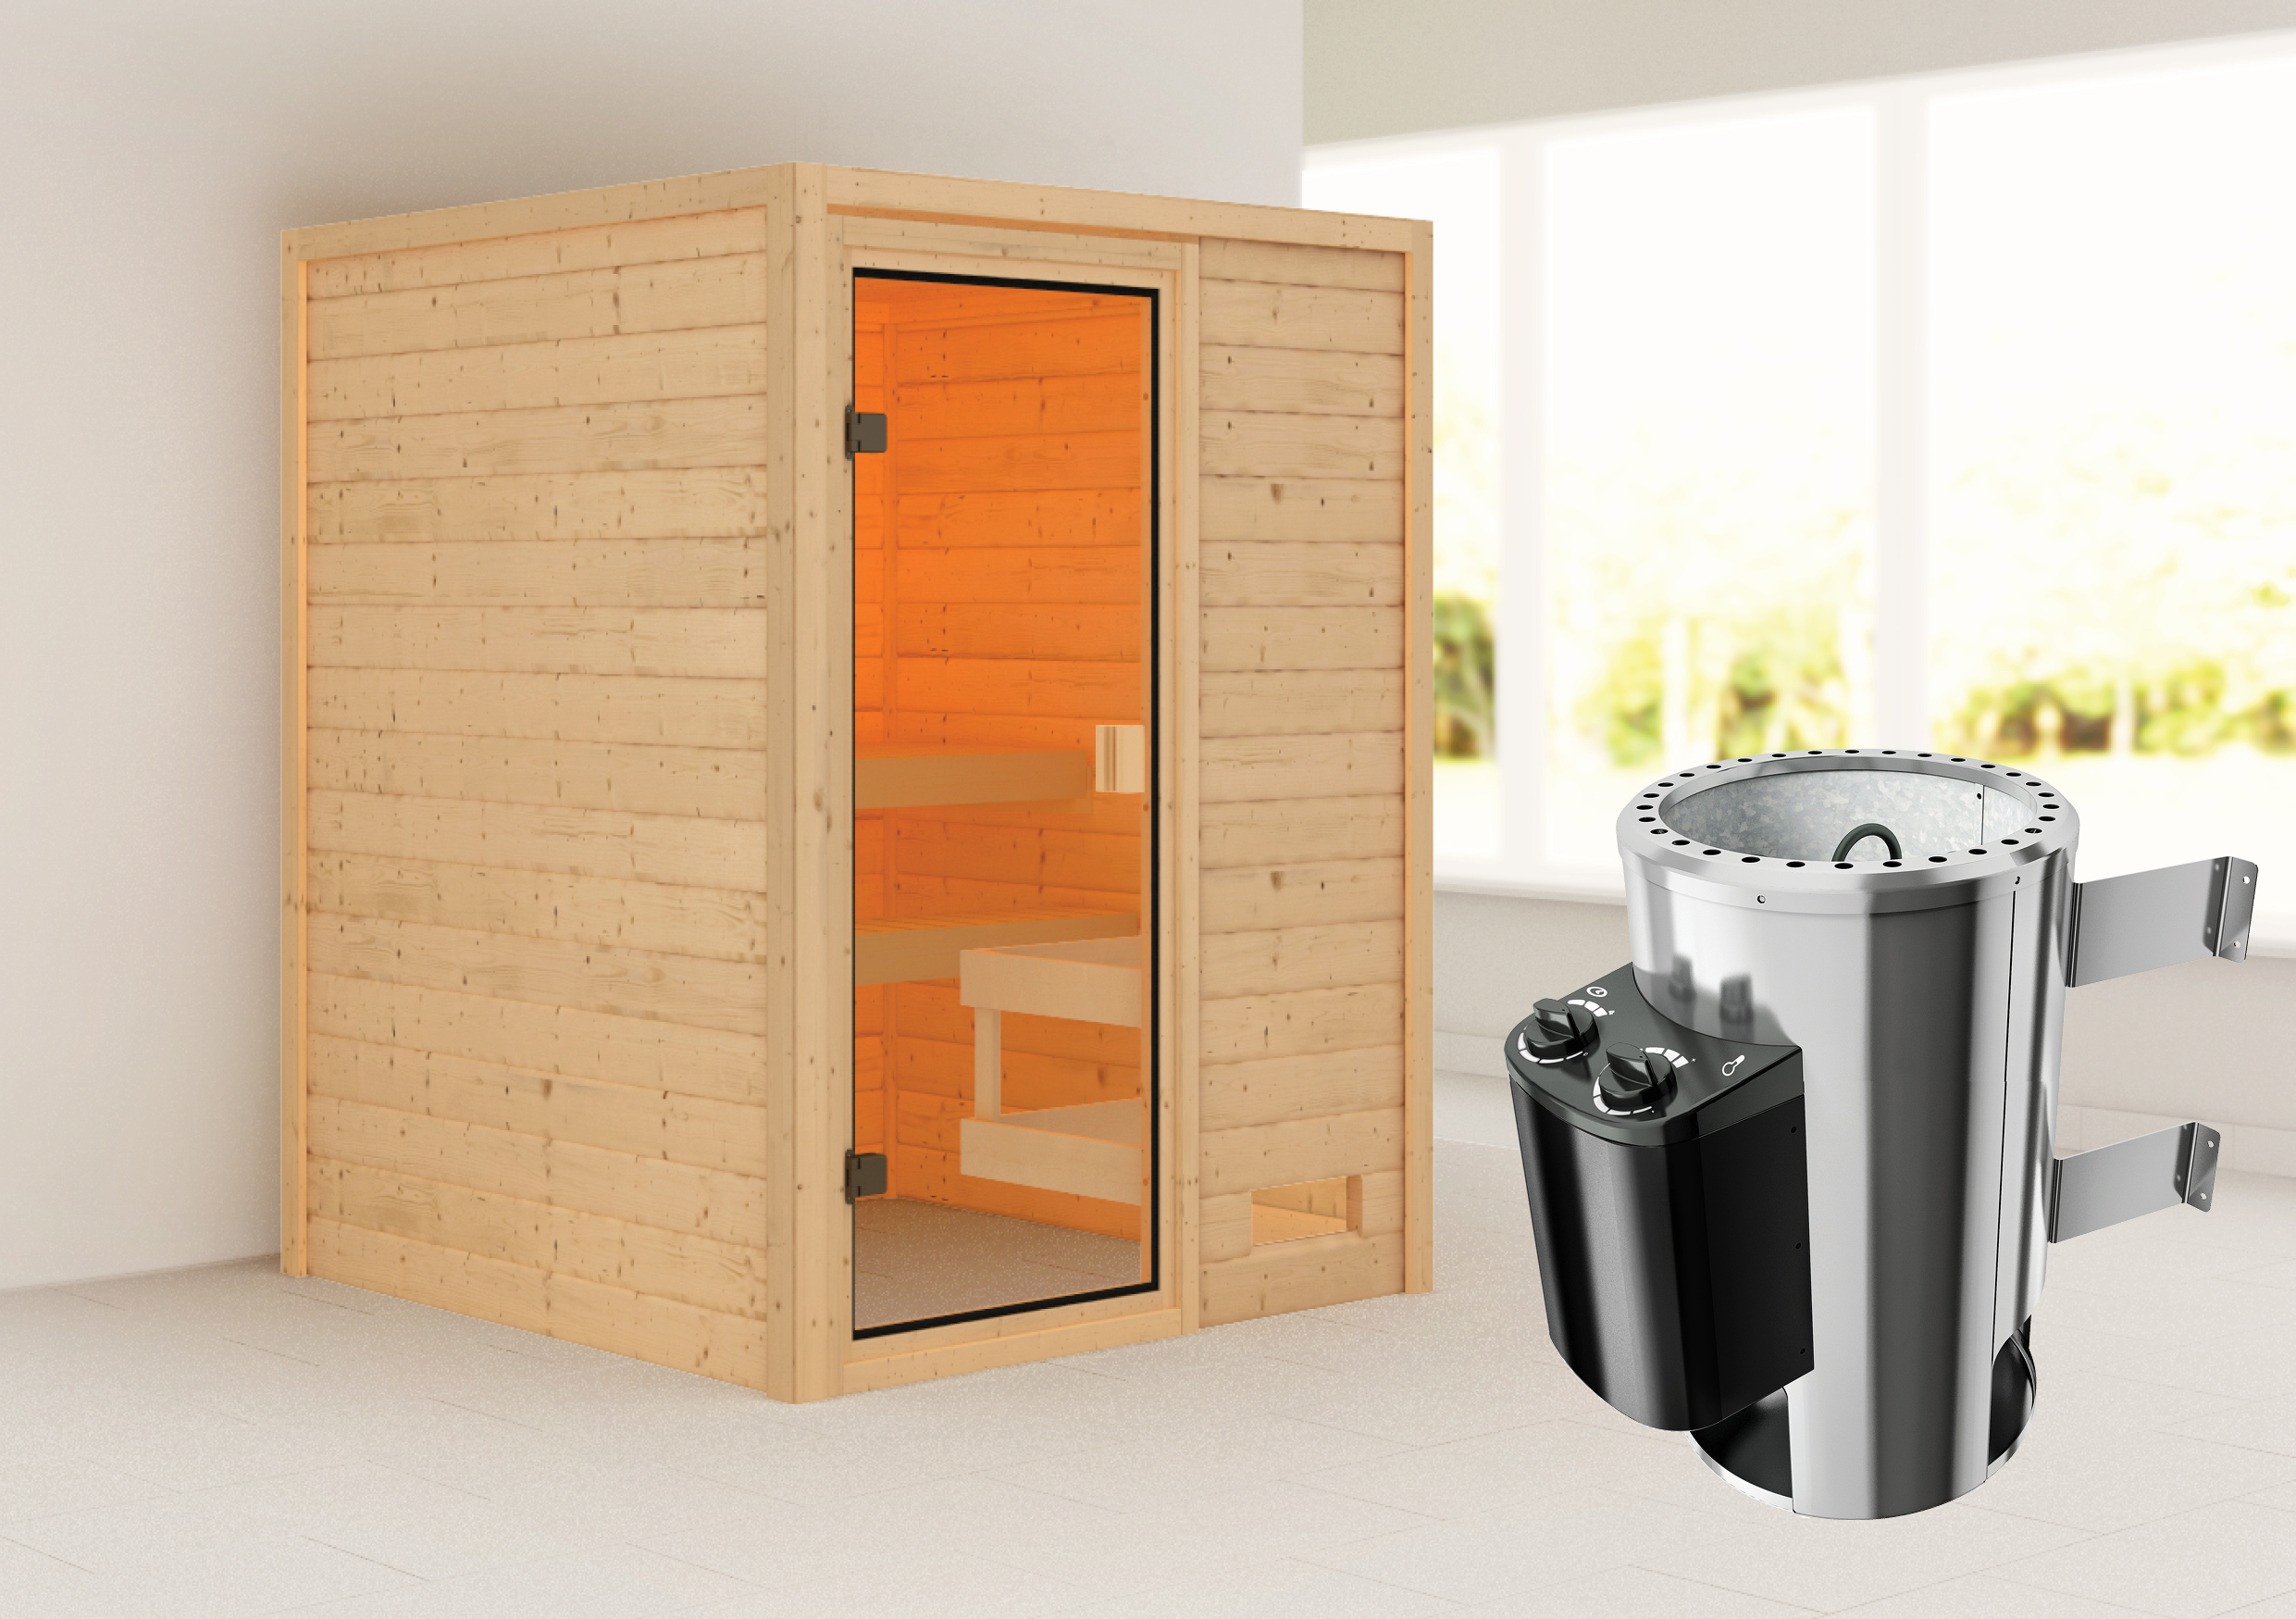 Woodfeeling Sauna Sandra 38mm 230V Saunaofen 3,6 kW intern Bild 1